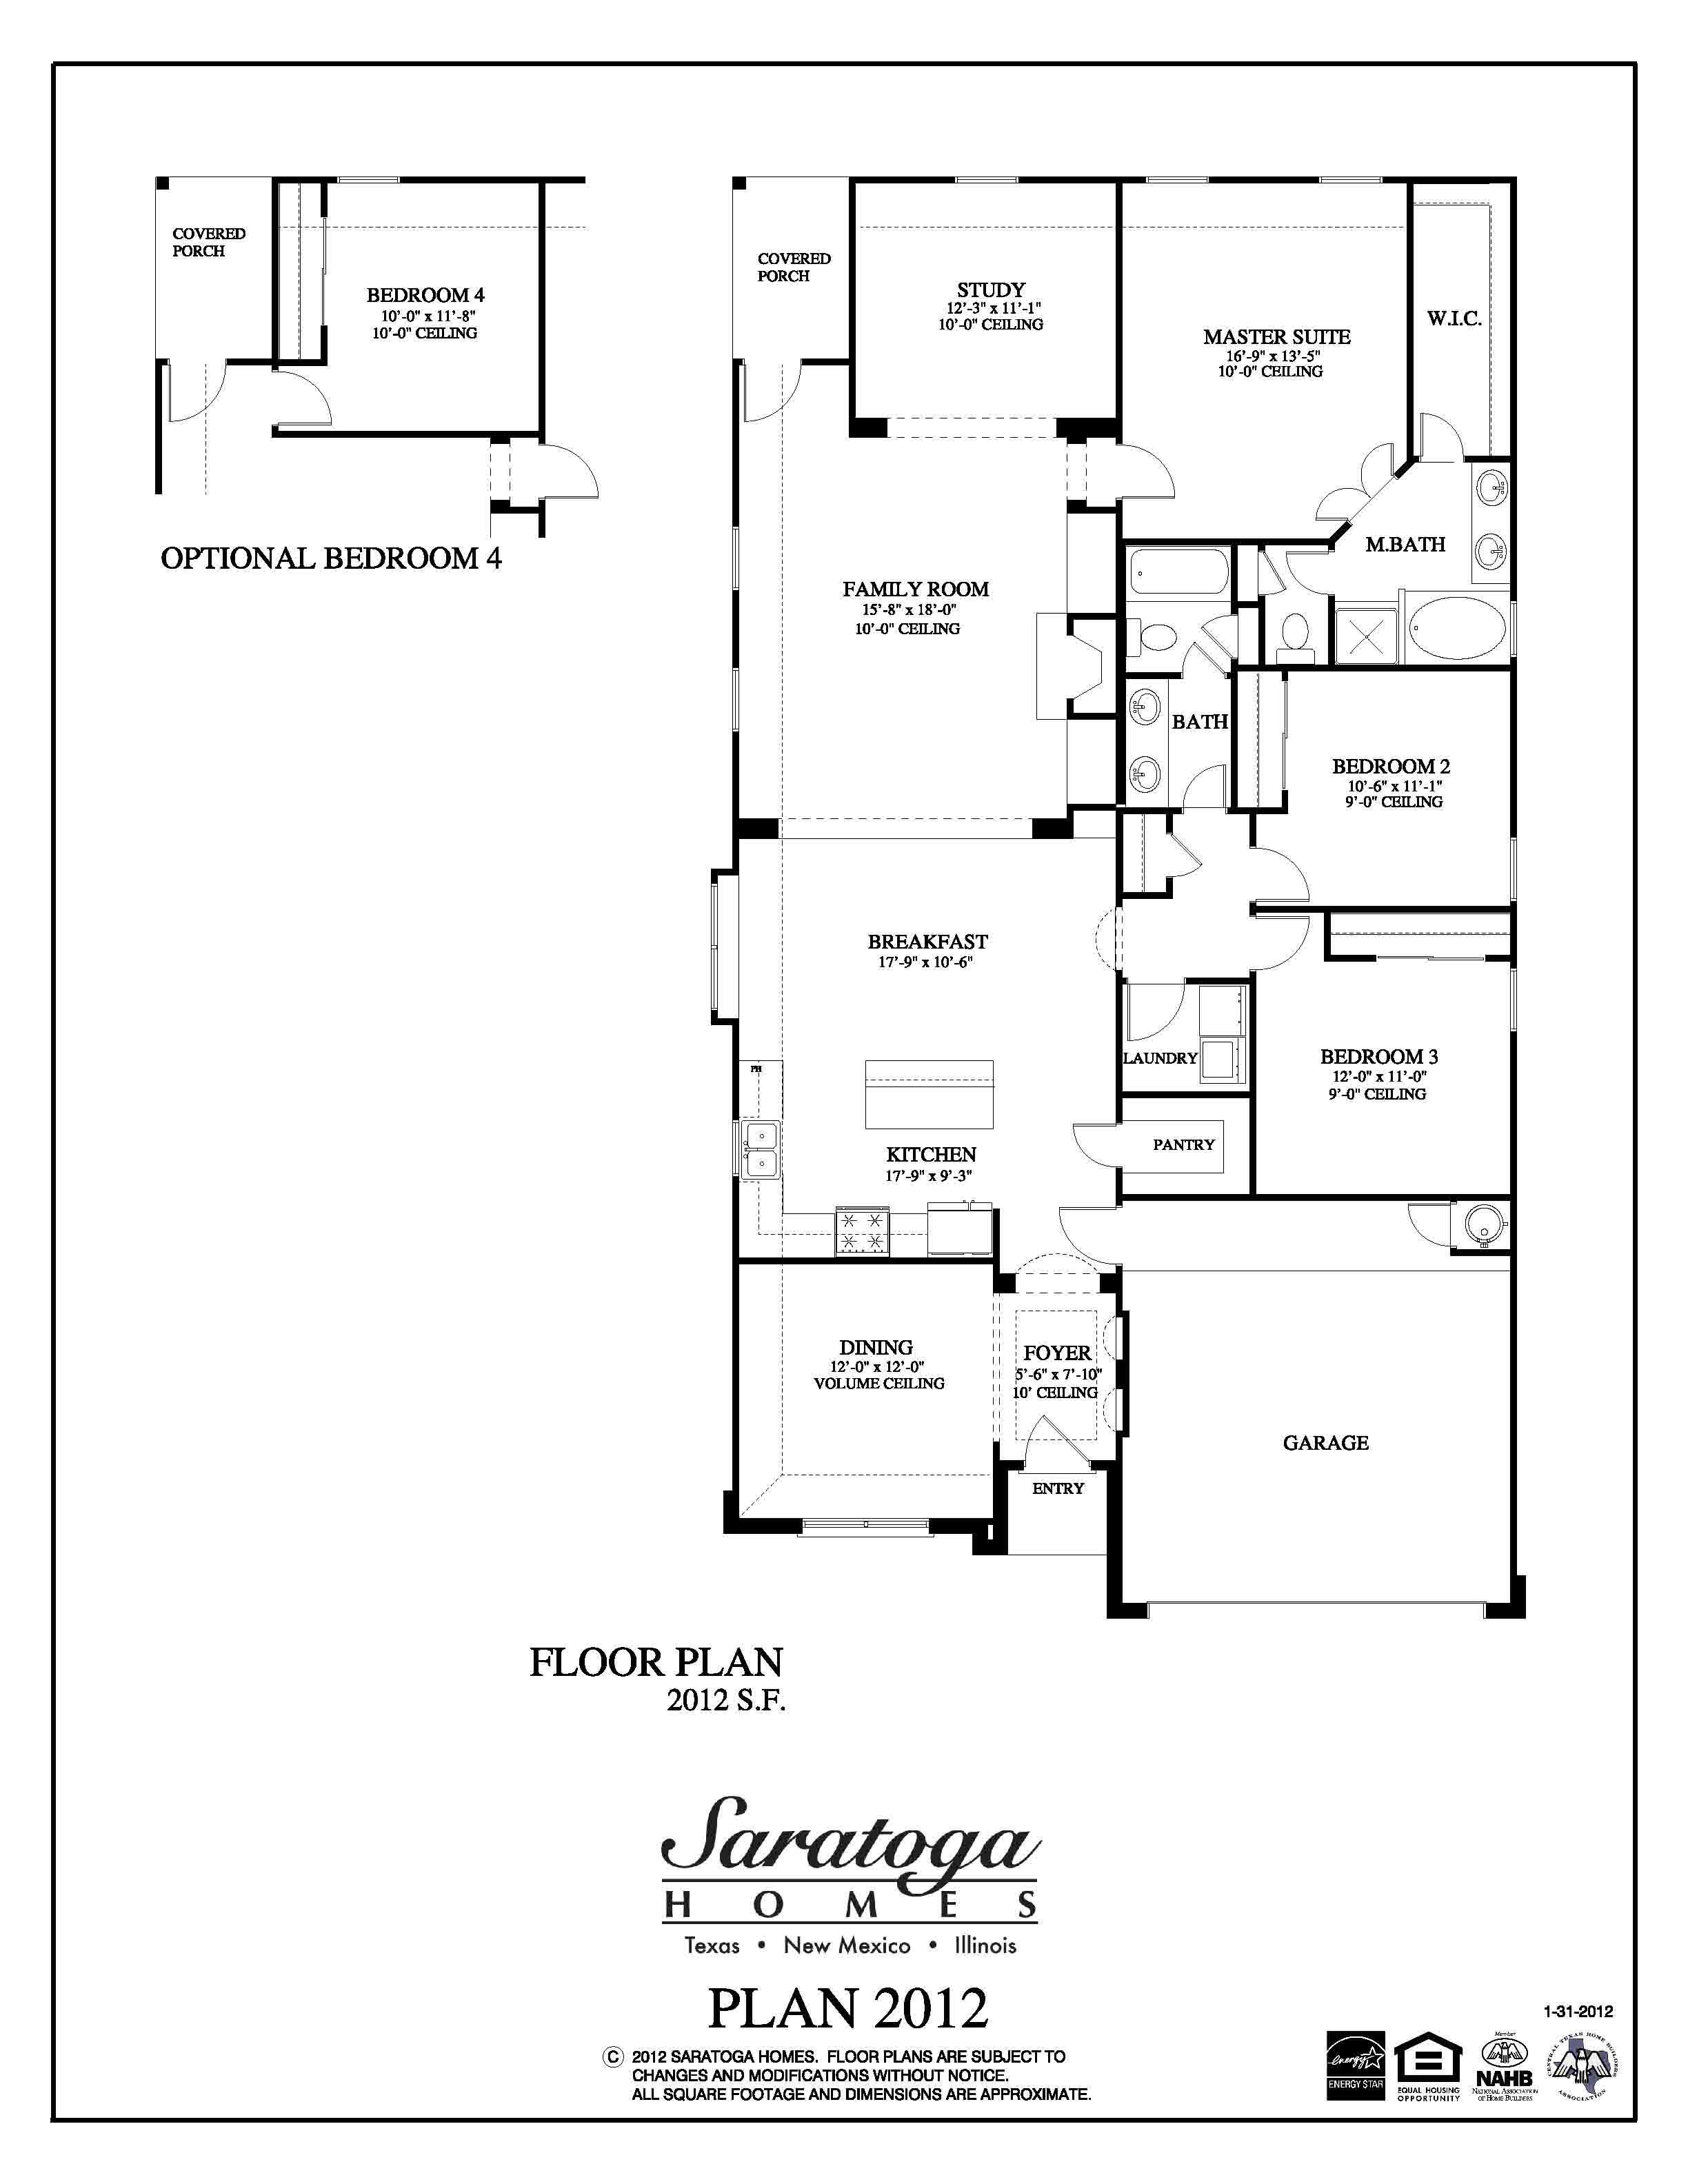 Lovely Saratoga Homes Floor Plans #10: Plan 2012